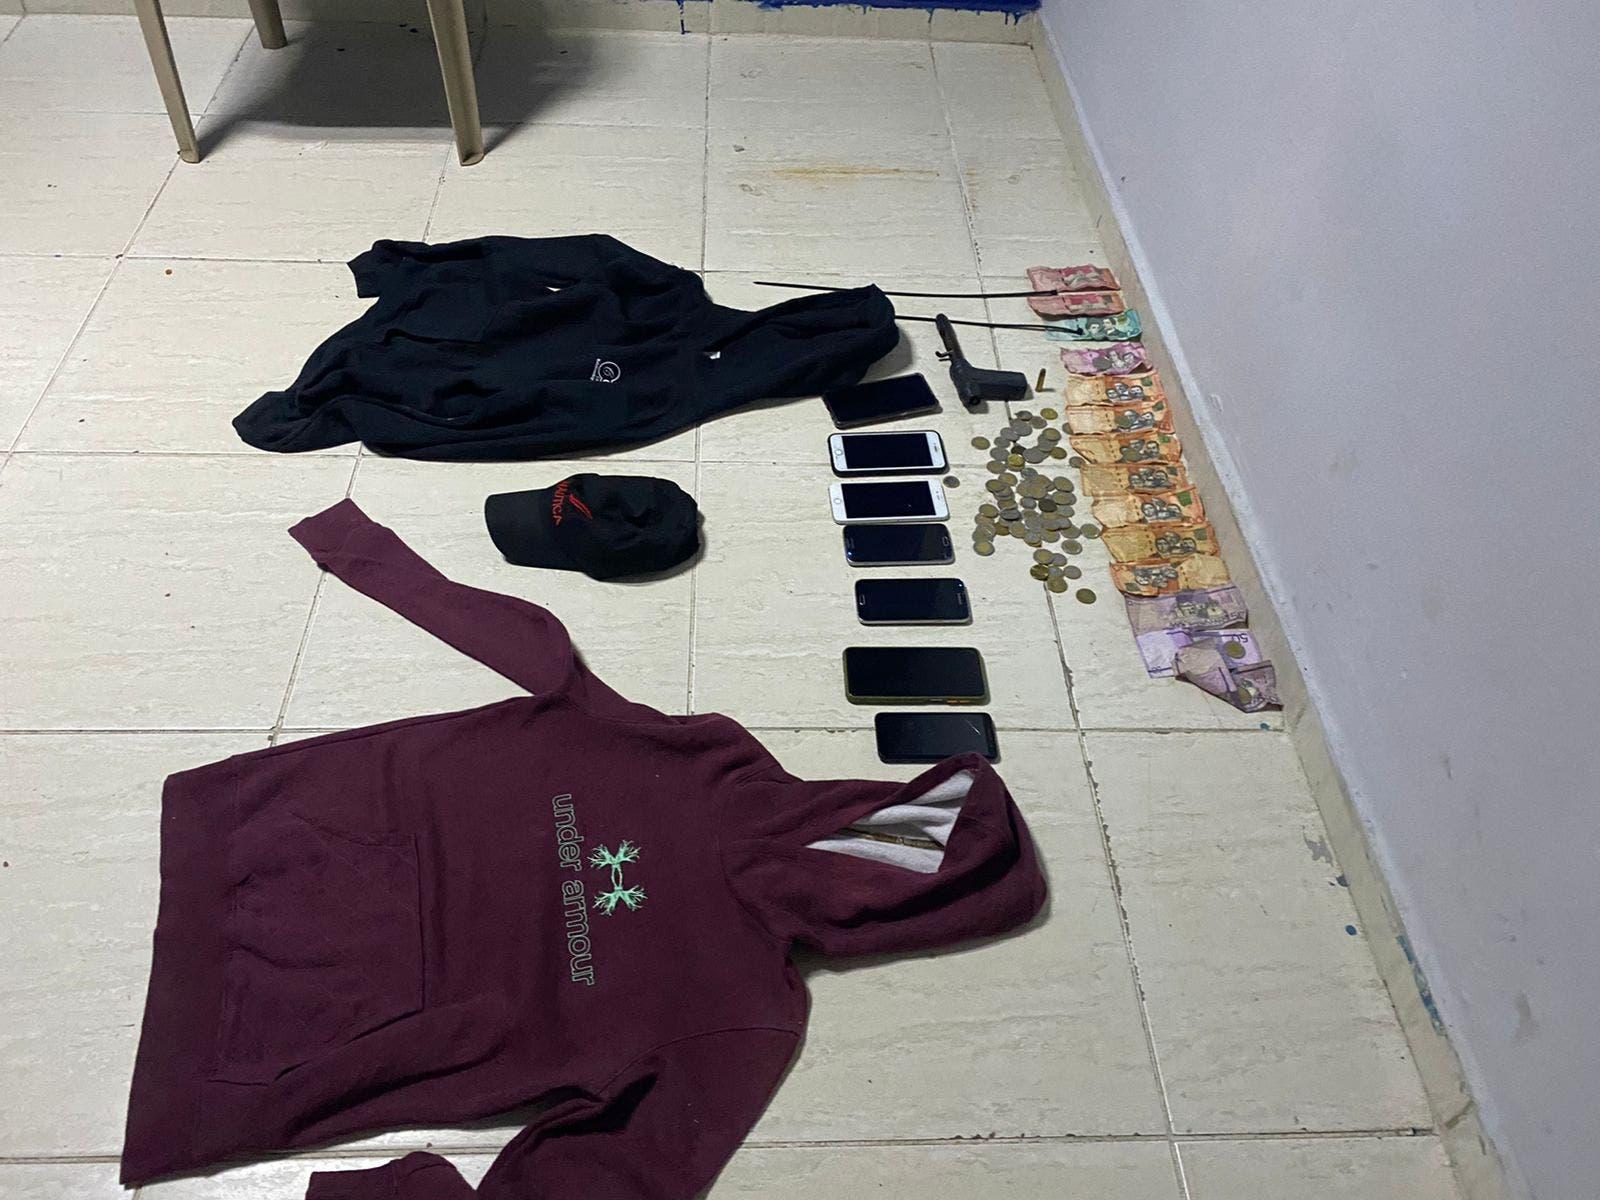 Policía desarticula banda asaltaba bancas de lotería en SFM